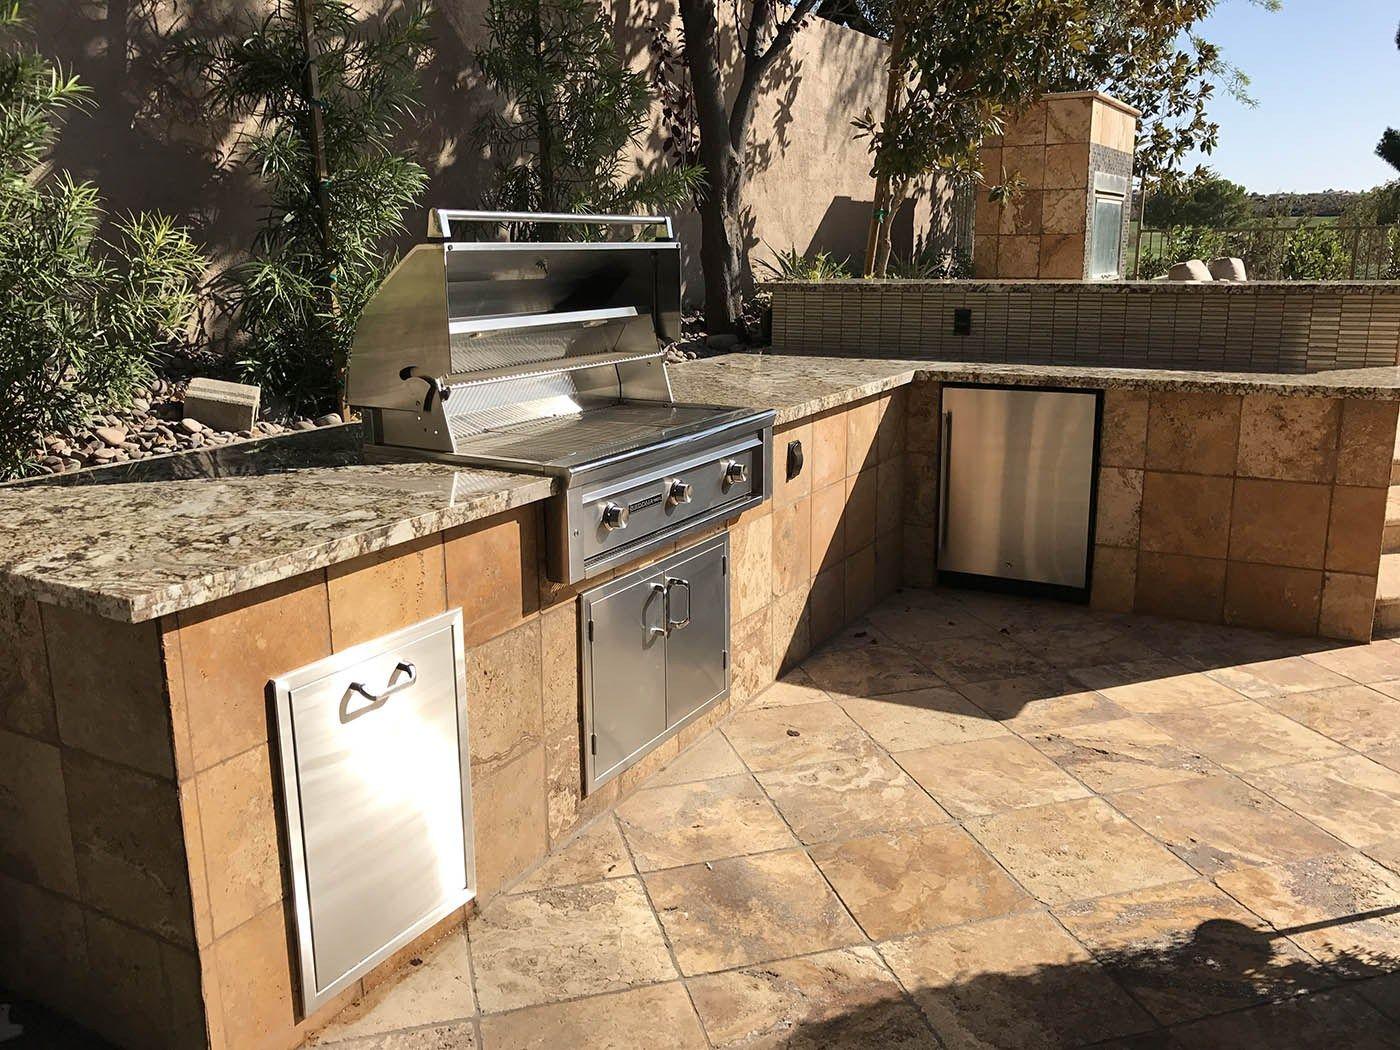 Custom Barbecue Island Design By Bbq Concepts Of Las Vegas Nevada Custom Outdoor Living Modern Outdoor Kitchen Outdoor Kitchen Living Area Design